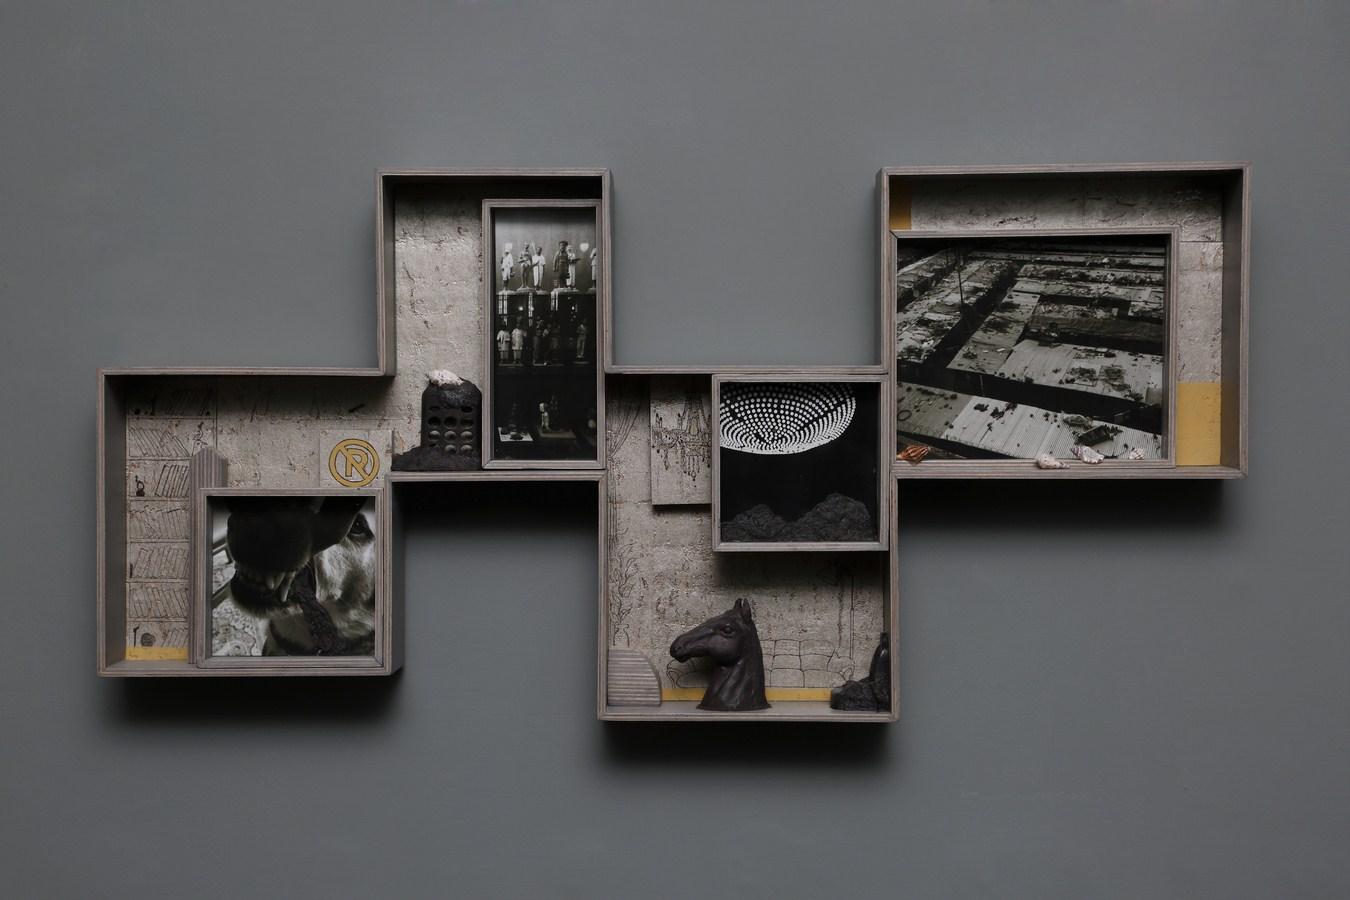 "Dweller of Metropolis - VIII | Paper Mache, photograph, plywood, wood, acrylic, wallpaper, auto paint, fiberglass | 17"" x 35"" | 2017"